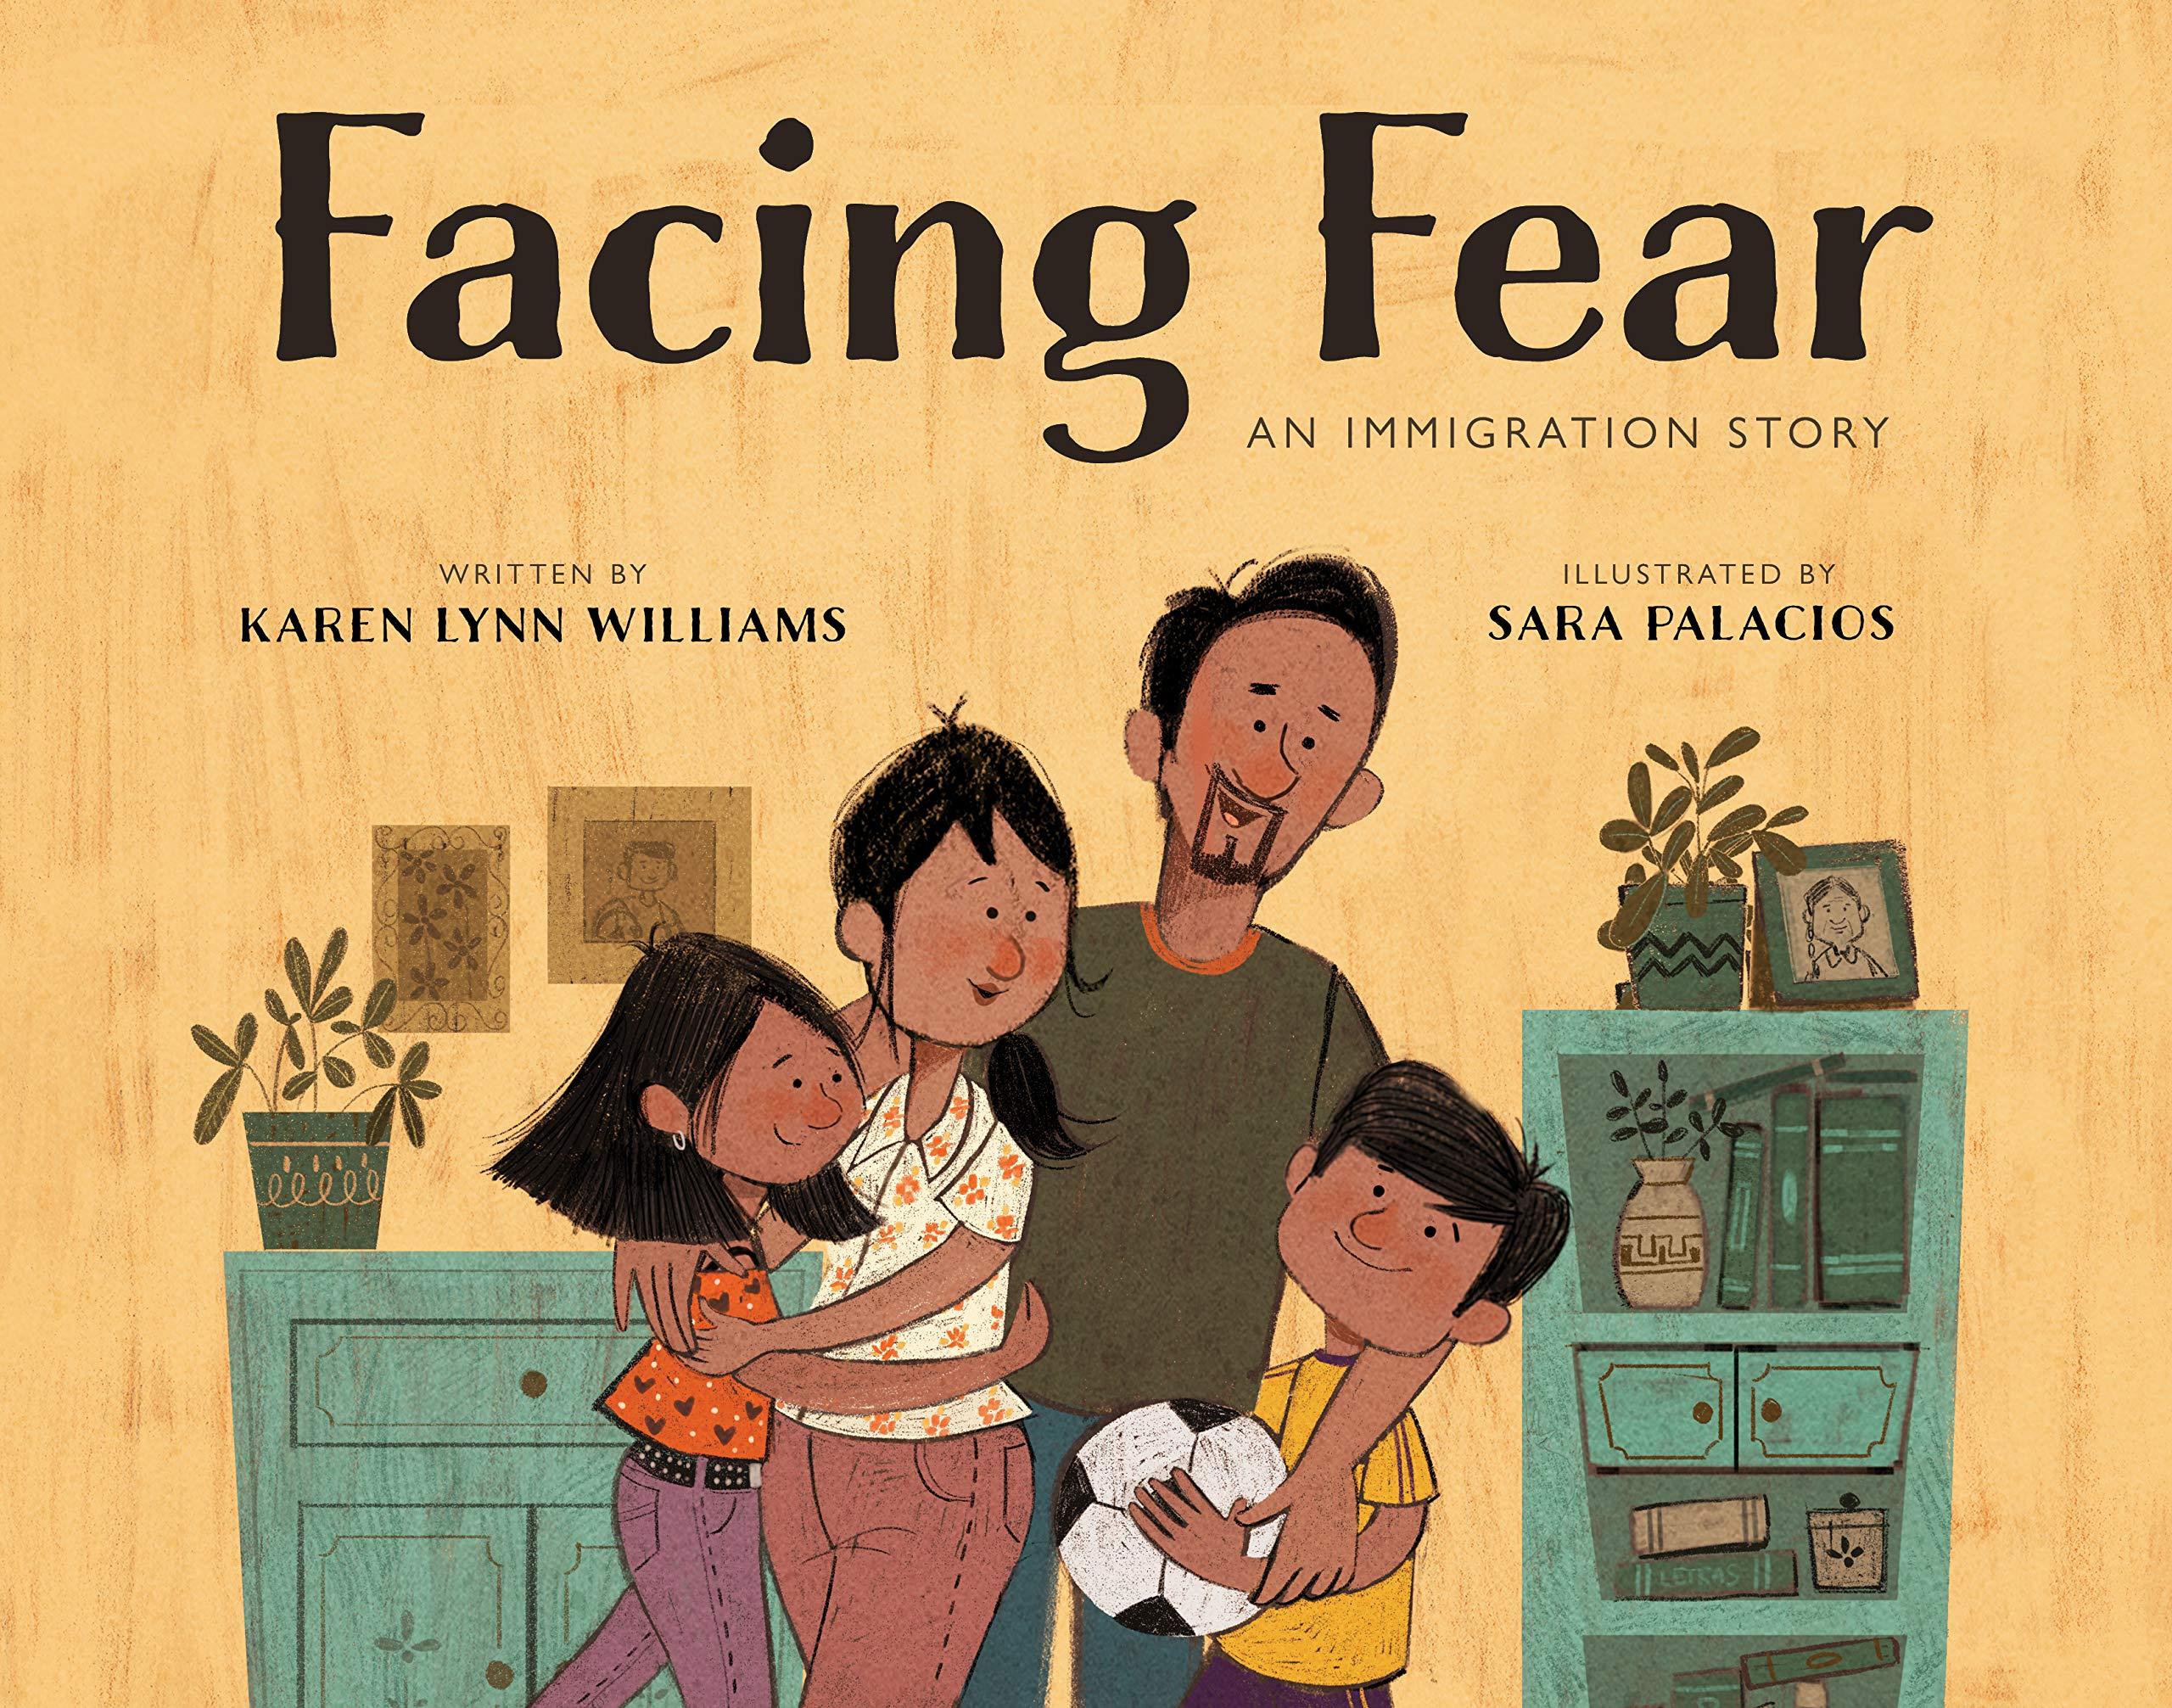 Facing Fear: Williams, Karen Lynn, Palacios, Sara: 9780802854902:  Amazon.com: Books